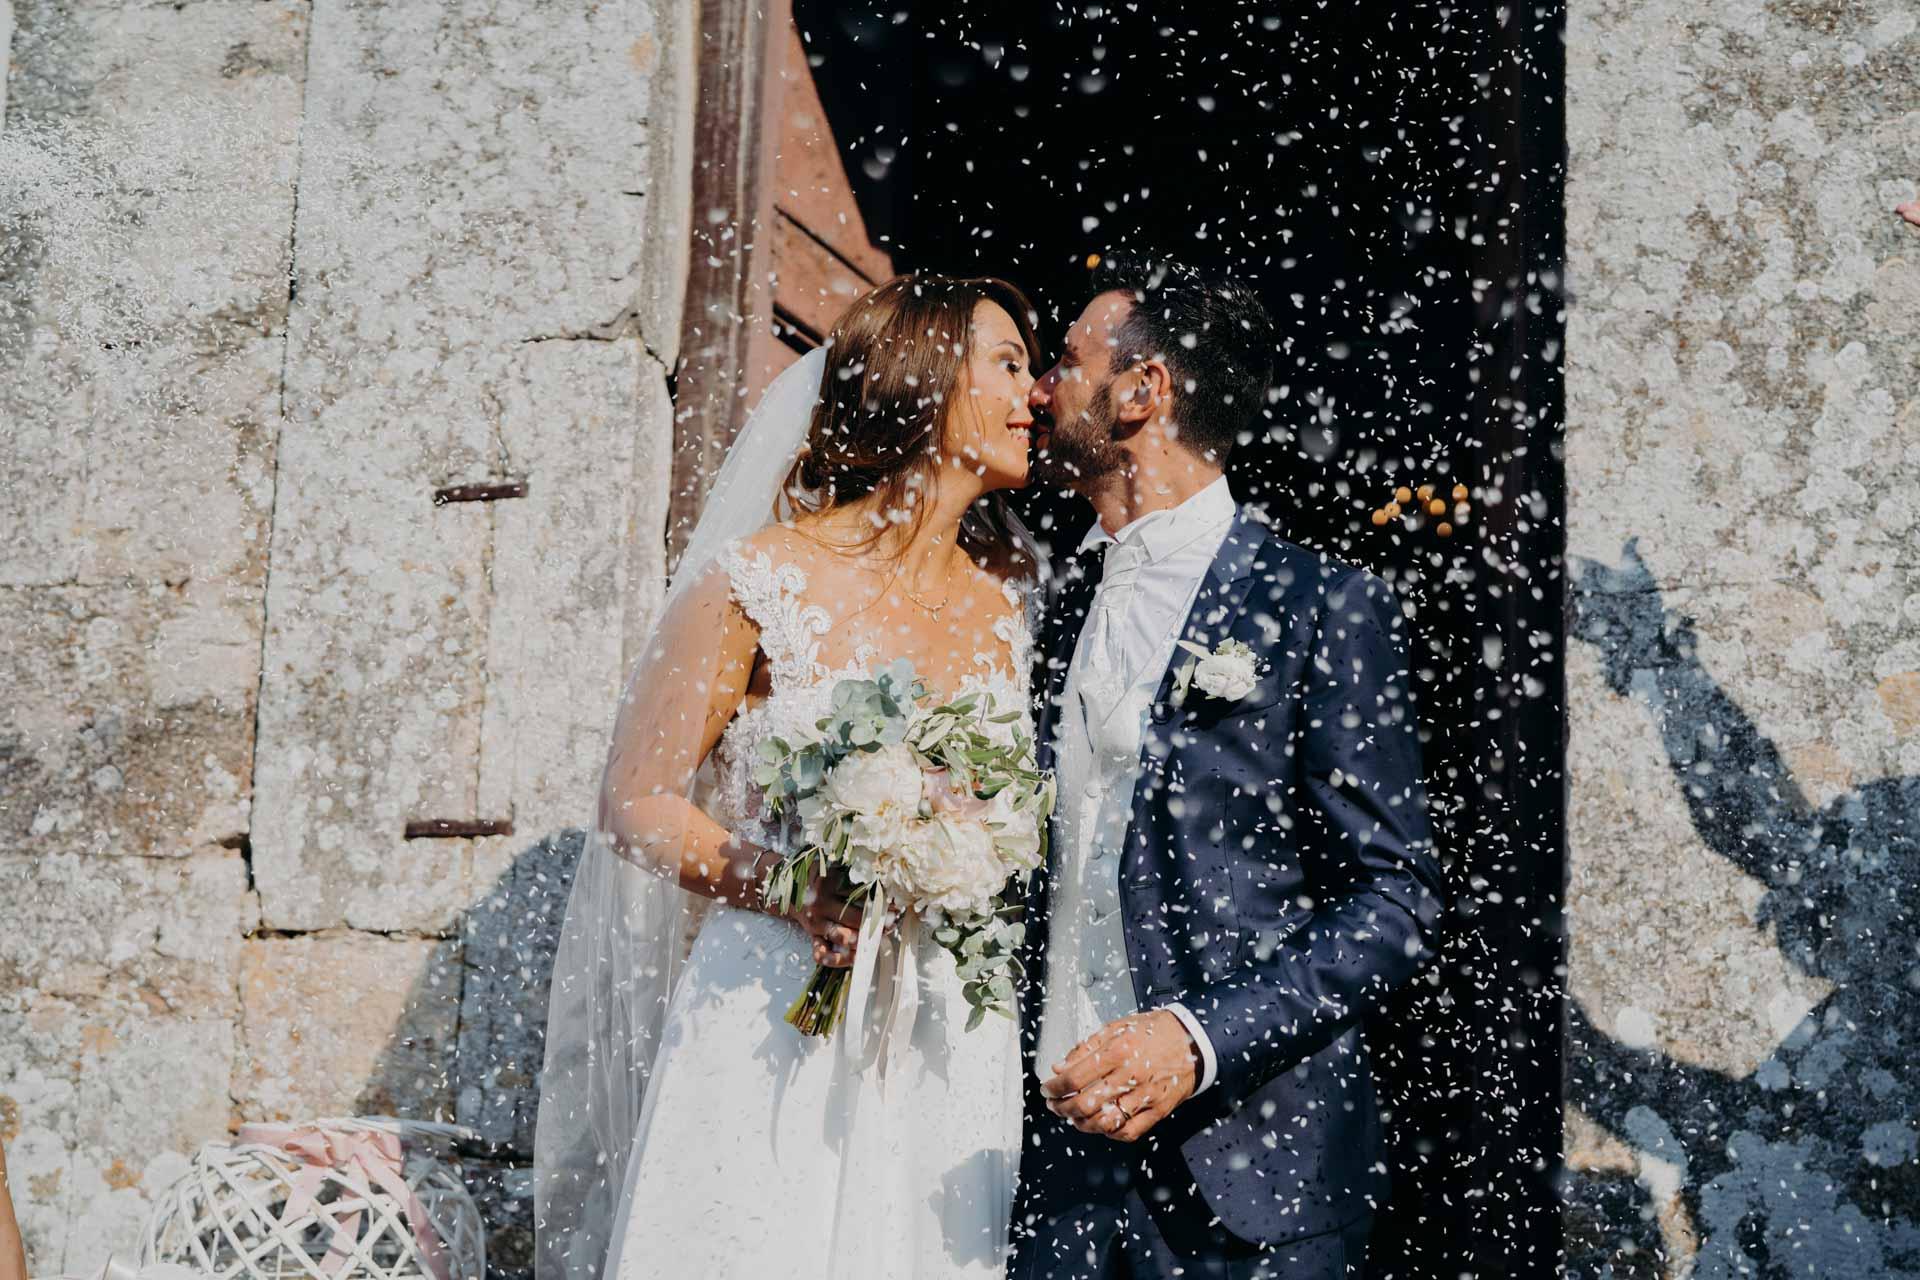 fotografo_matrimonio_toscana_poggio_tondo_60